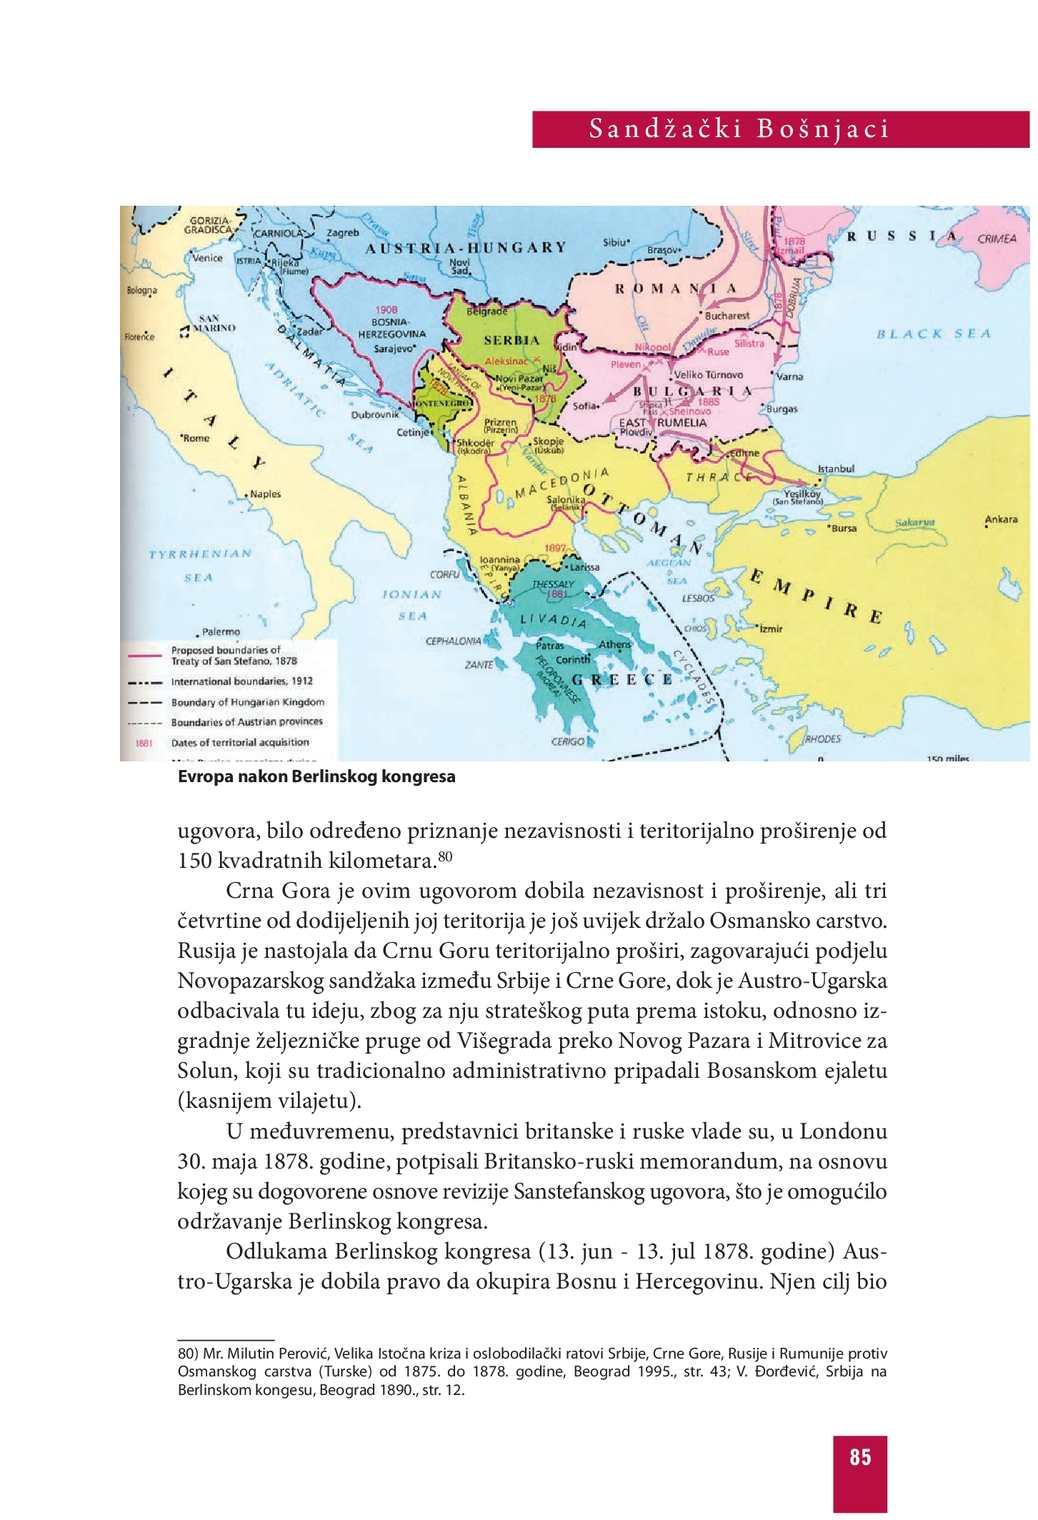 Karta Balkana 1878.Sandzacki Bosnjaci Calameo Downloader